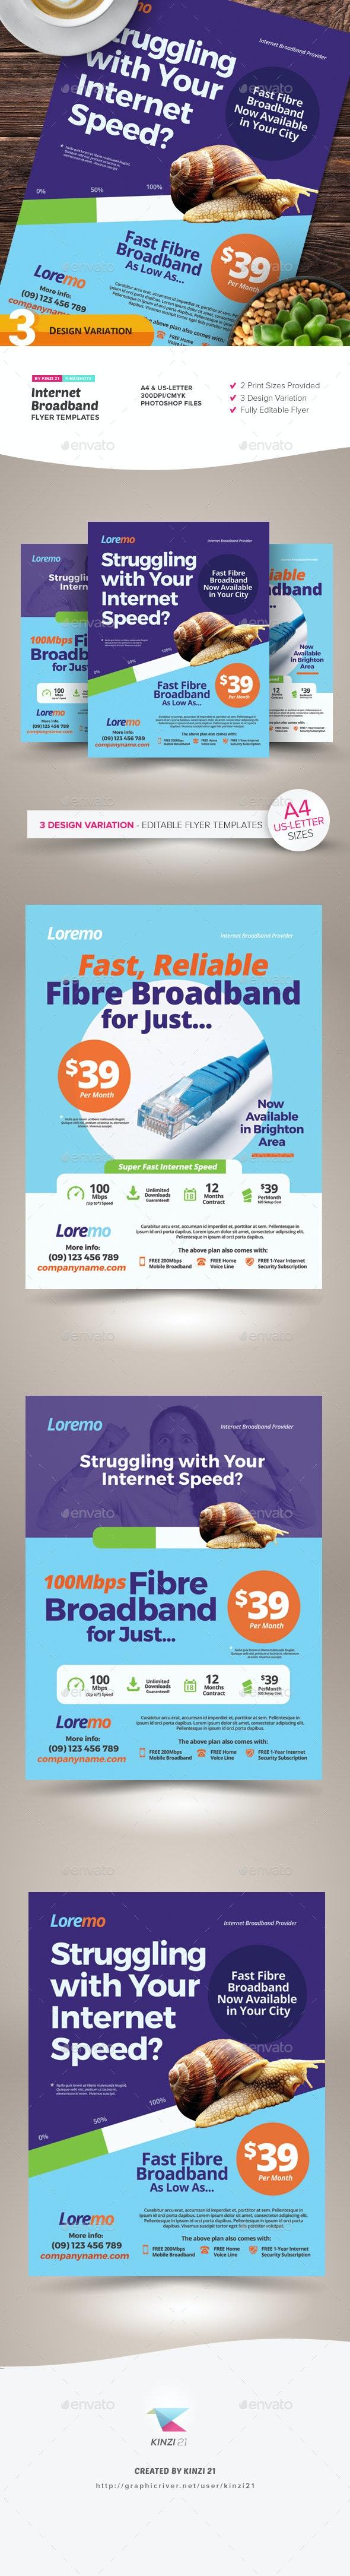 Internet Broadband Flyer Templates - Corporate Flyers